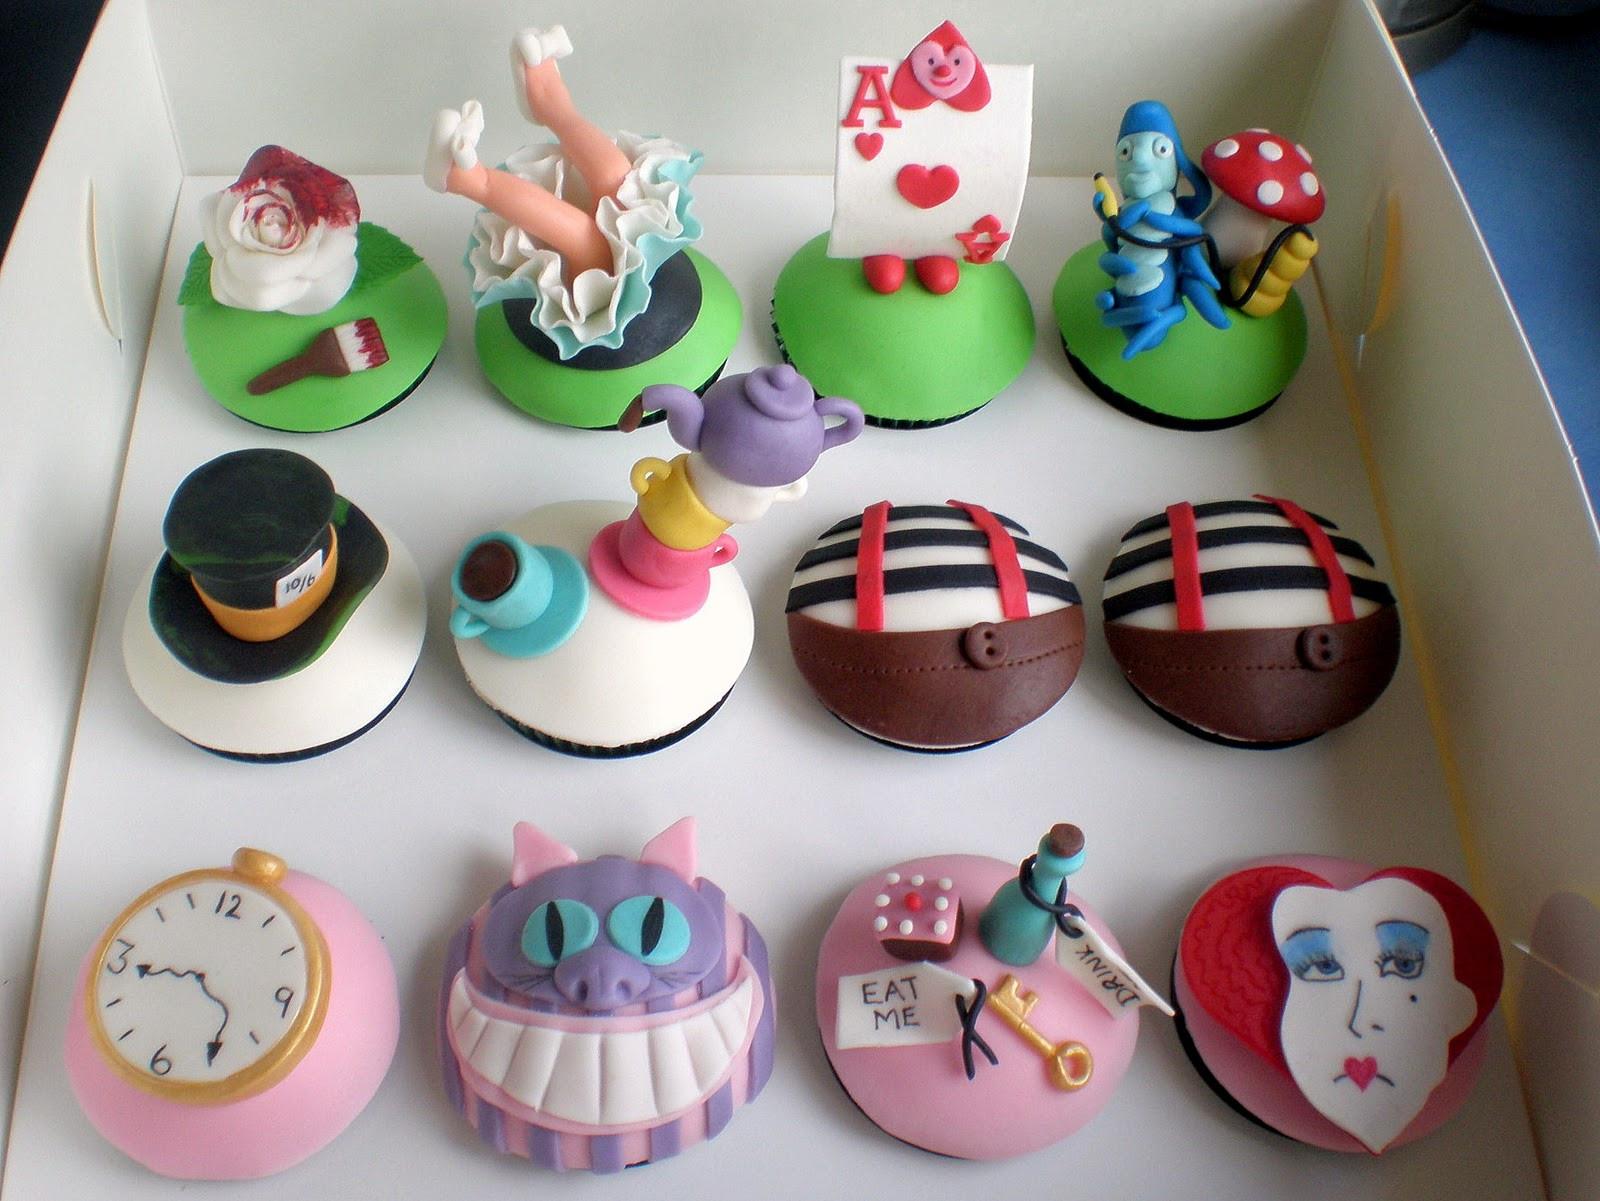 Alice In Wonderland Cupcakes  Sugar Siren Cakes Mackay Alice in Wonderland Cupcakes